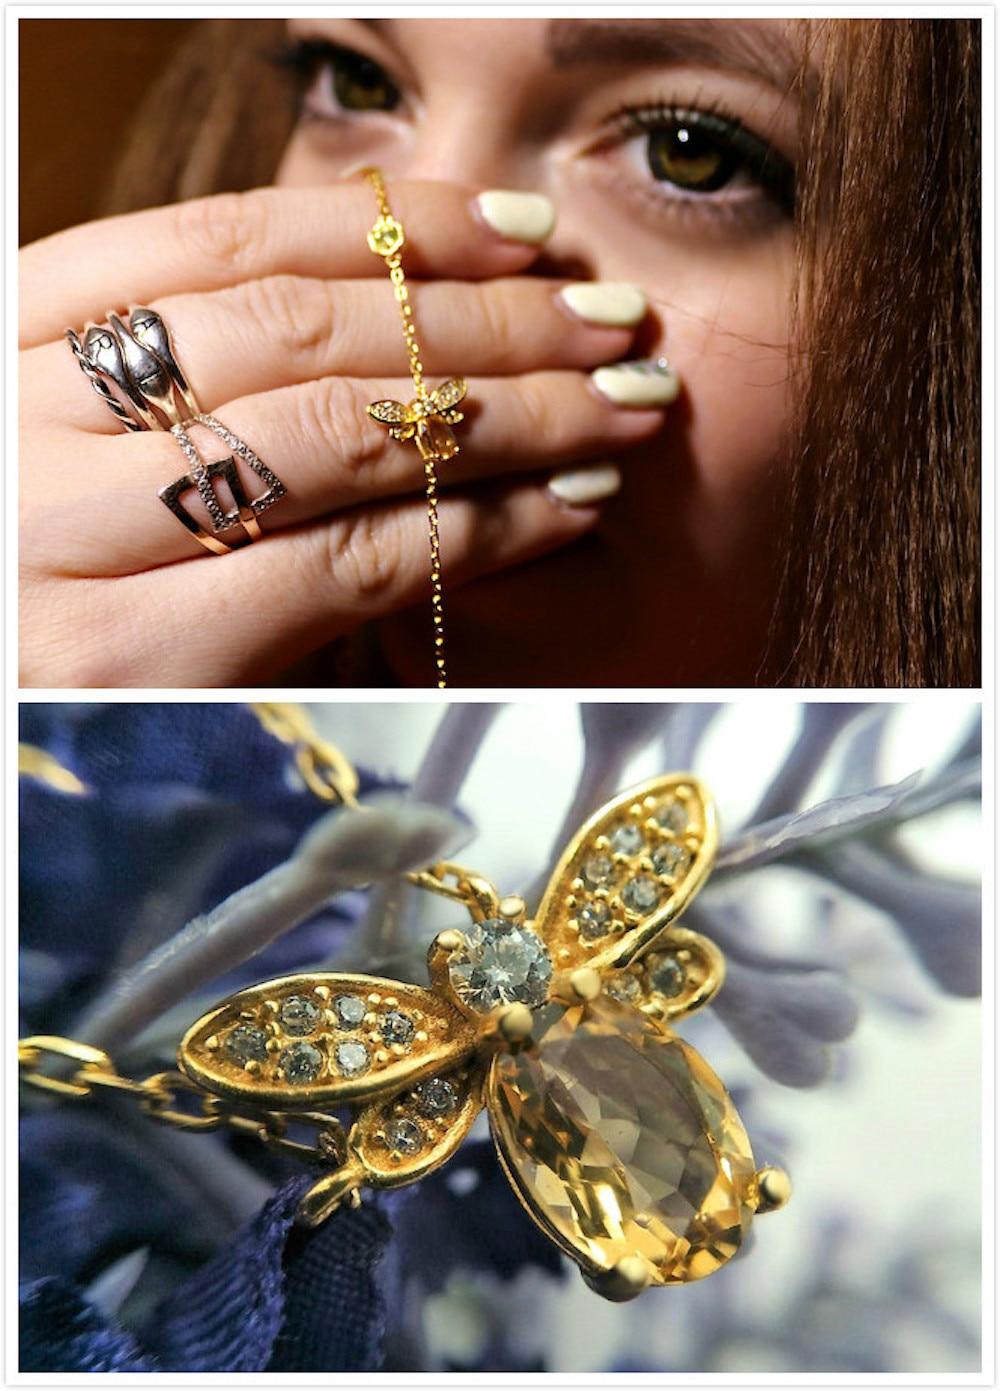 HTB1zMnwXN rK1RkHFqDq6yJAFXaw LAMOON Cute Bee 925 Sterling Silver Bracelet Woman love Citrine Gemstones Jewelry 14K Gold Plated Designer Jewellery LMHI002